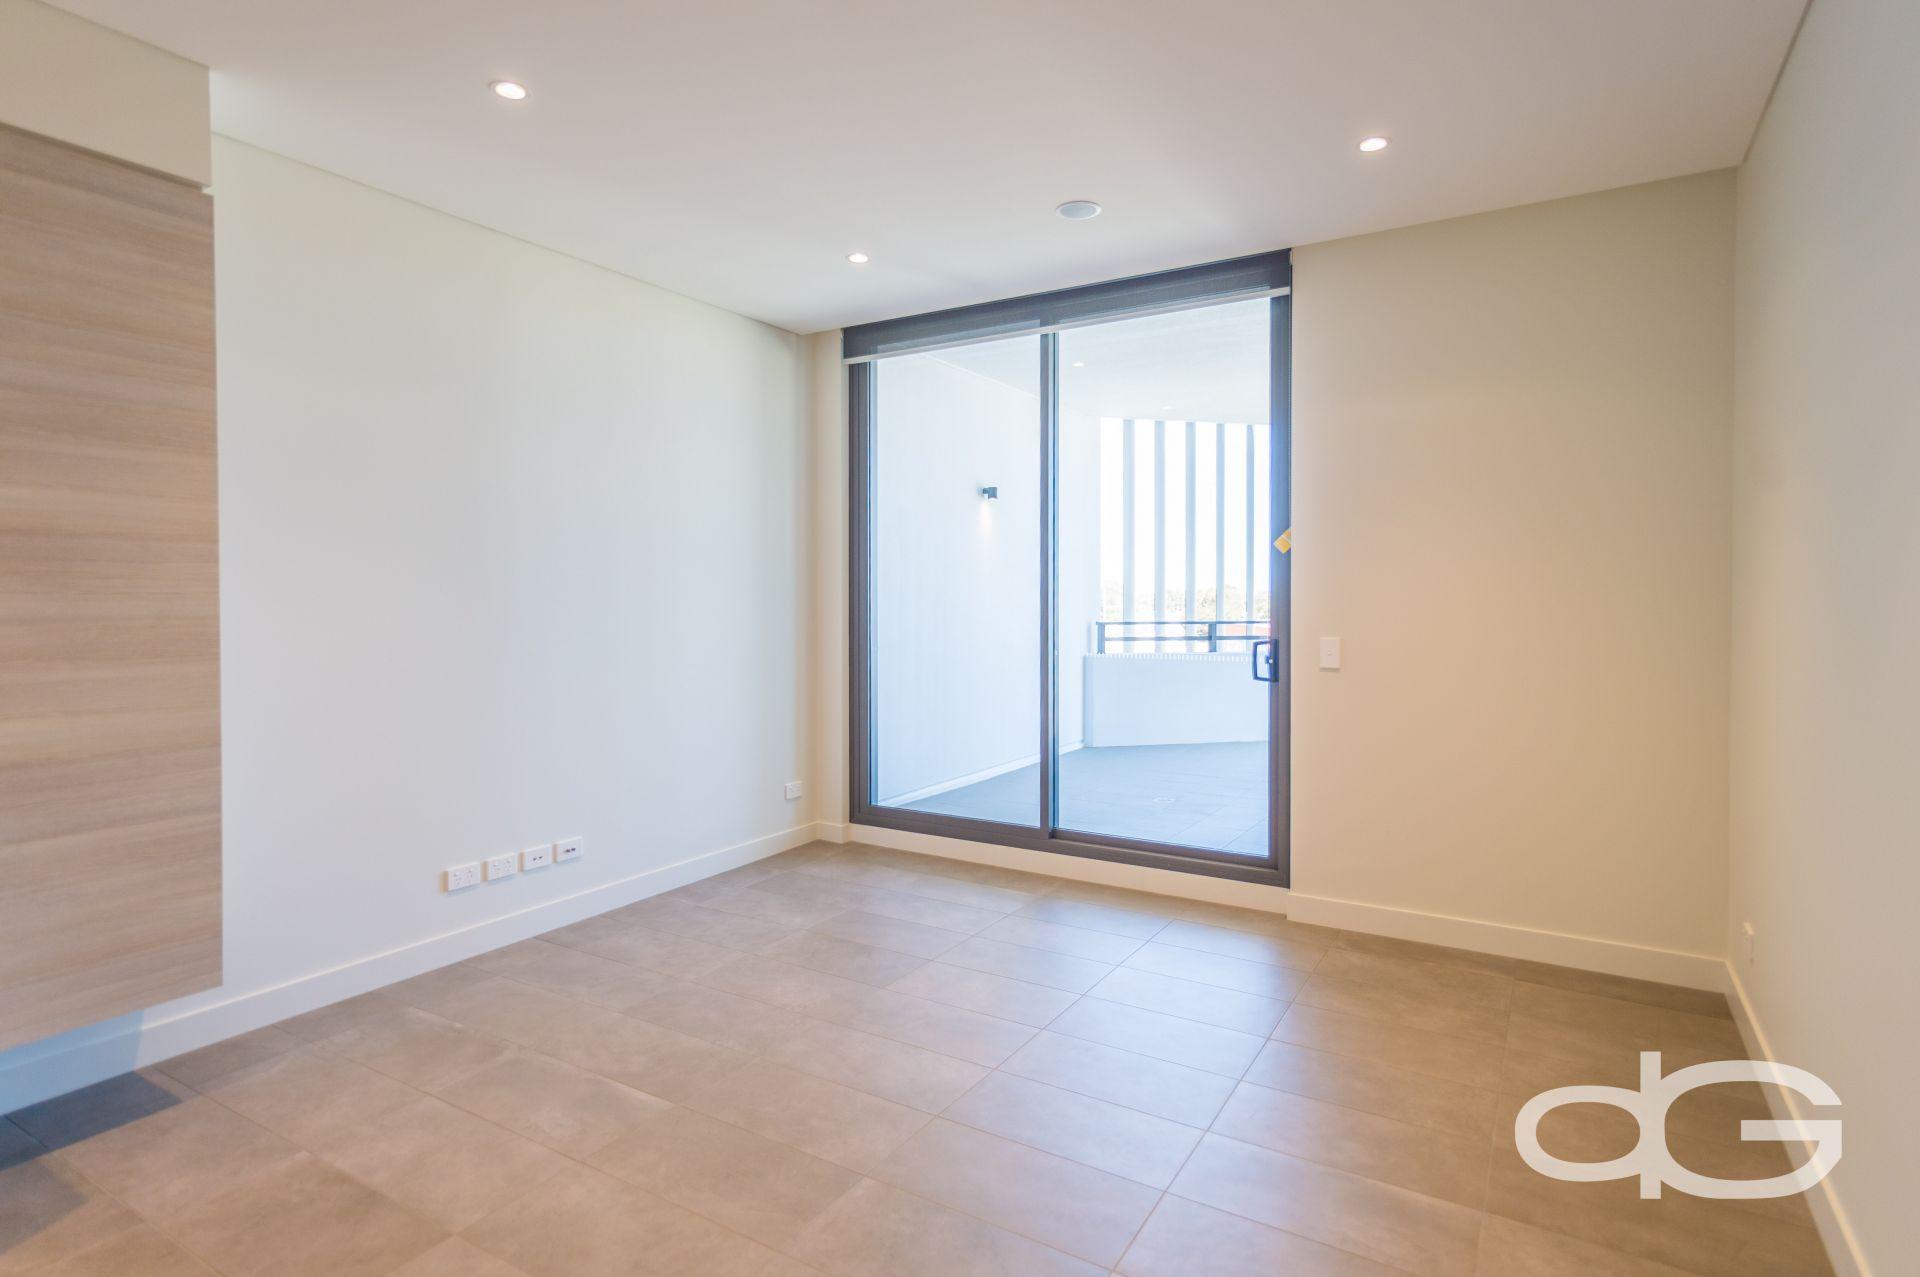 405/7 Cattalini Lane, North Fremantle